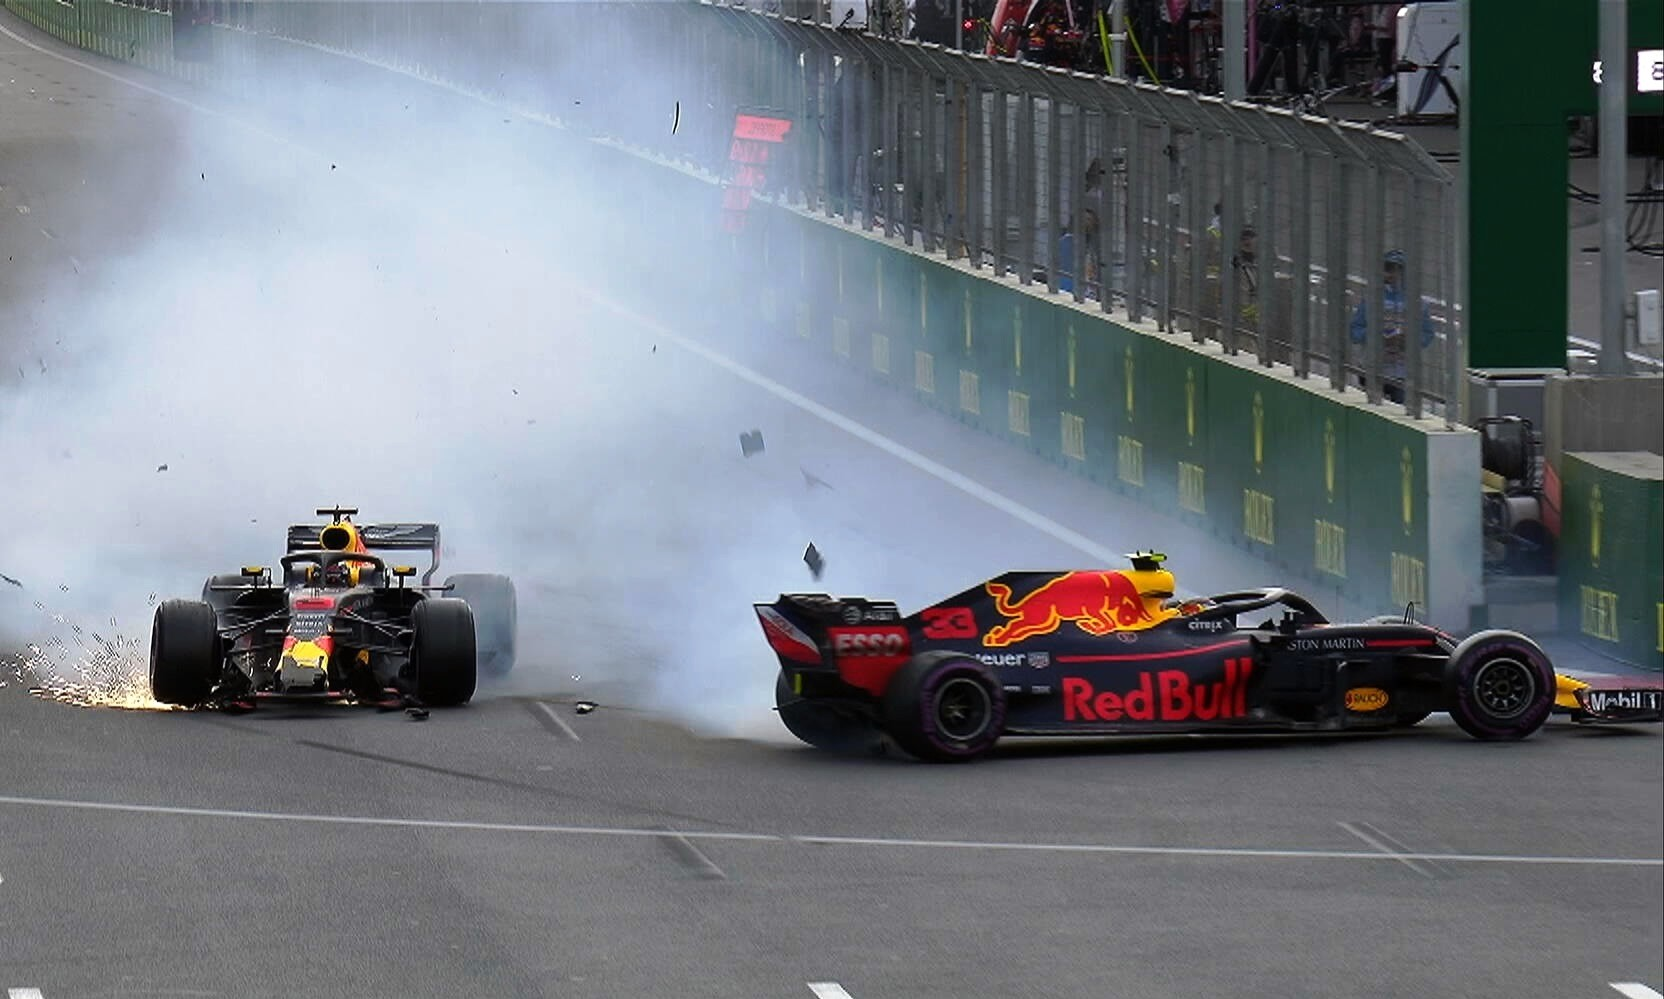 RBR drivers crash into each other at Baku 2018